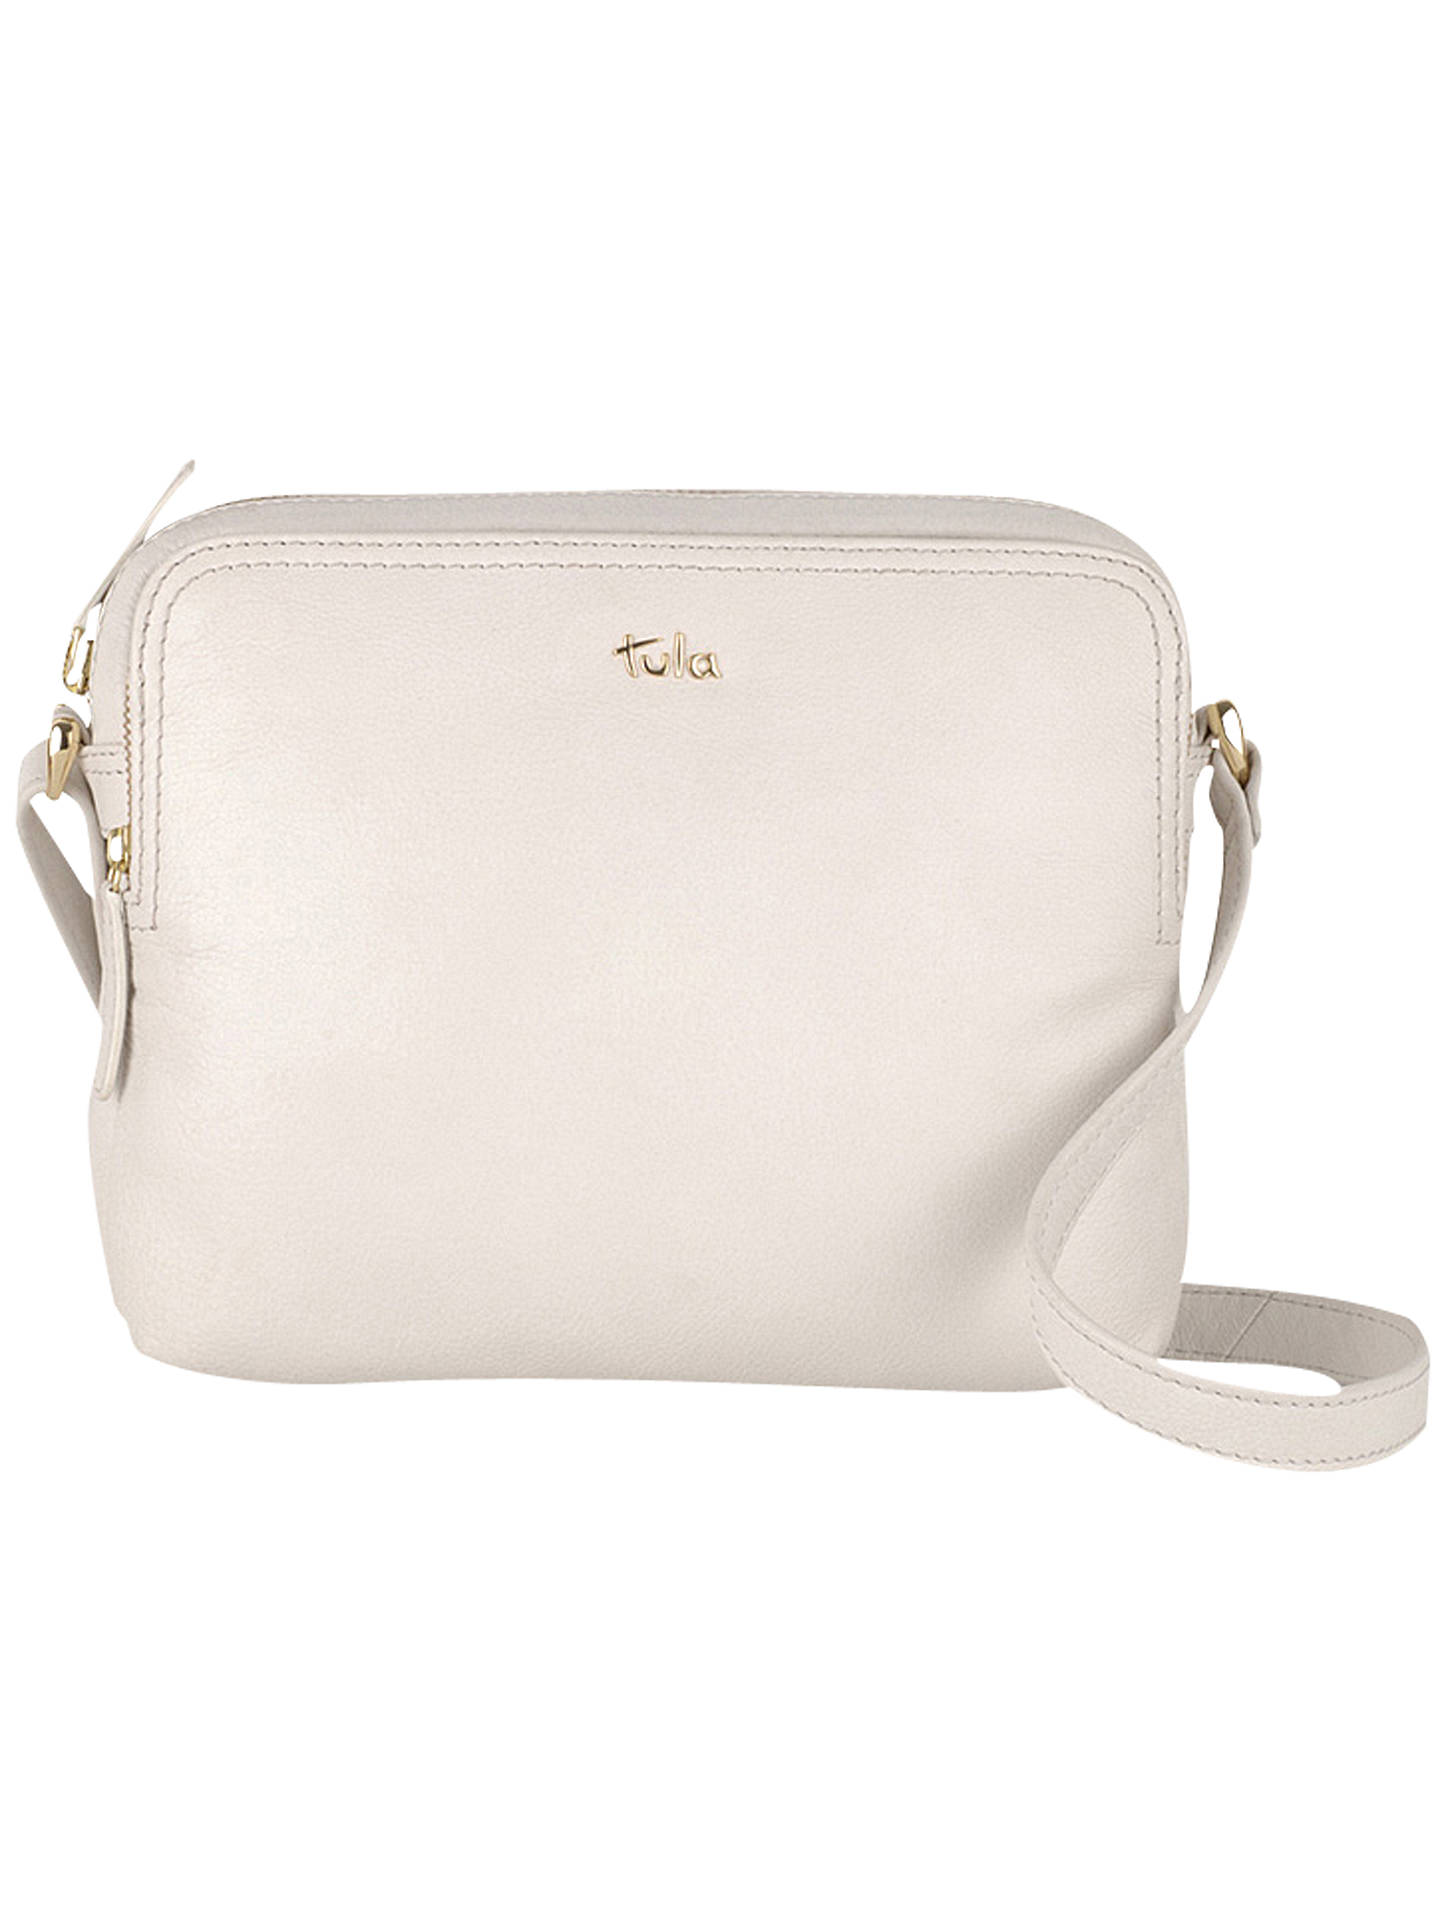 0d497b024b0 BuyTula Nappa Original Leather Medium Cross Body Bag, Ivory Online at  johnlewis.com ...